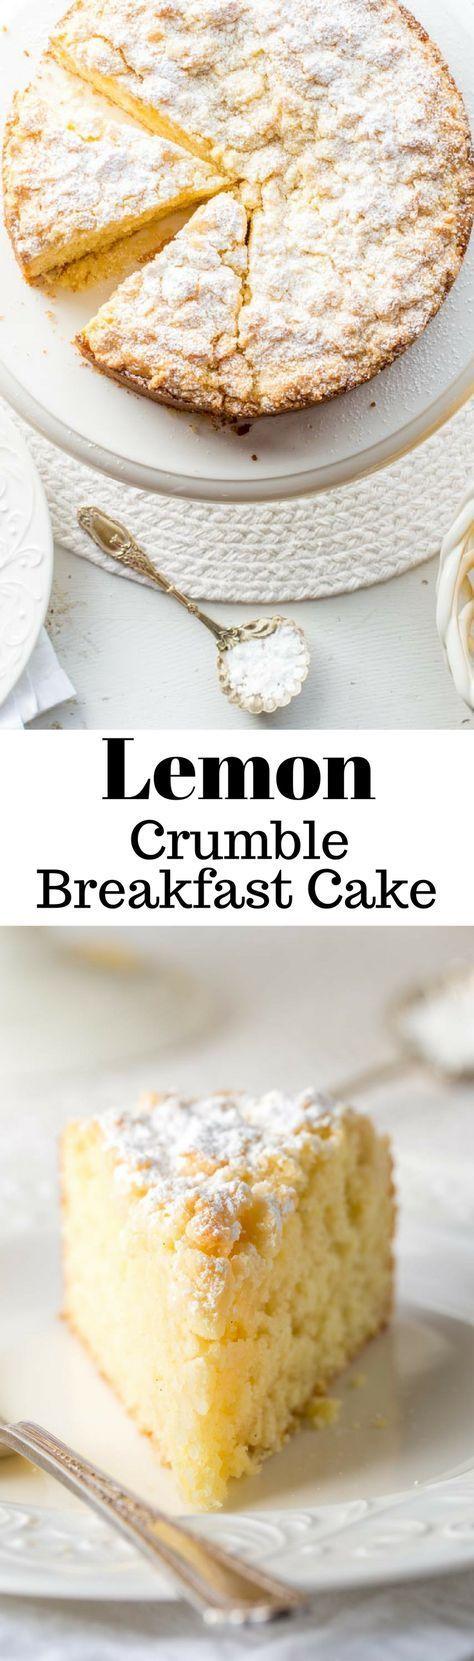 Lemon Crumble Breakfast Cake Lemon Crumble Breakfast Cake